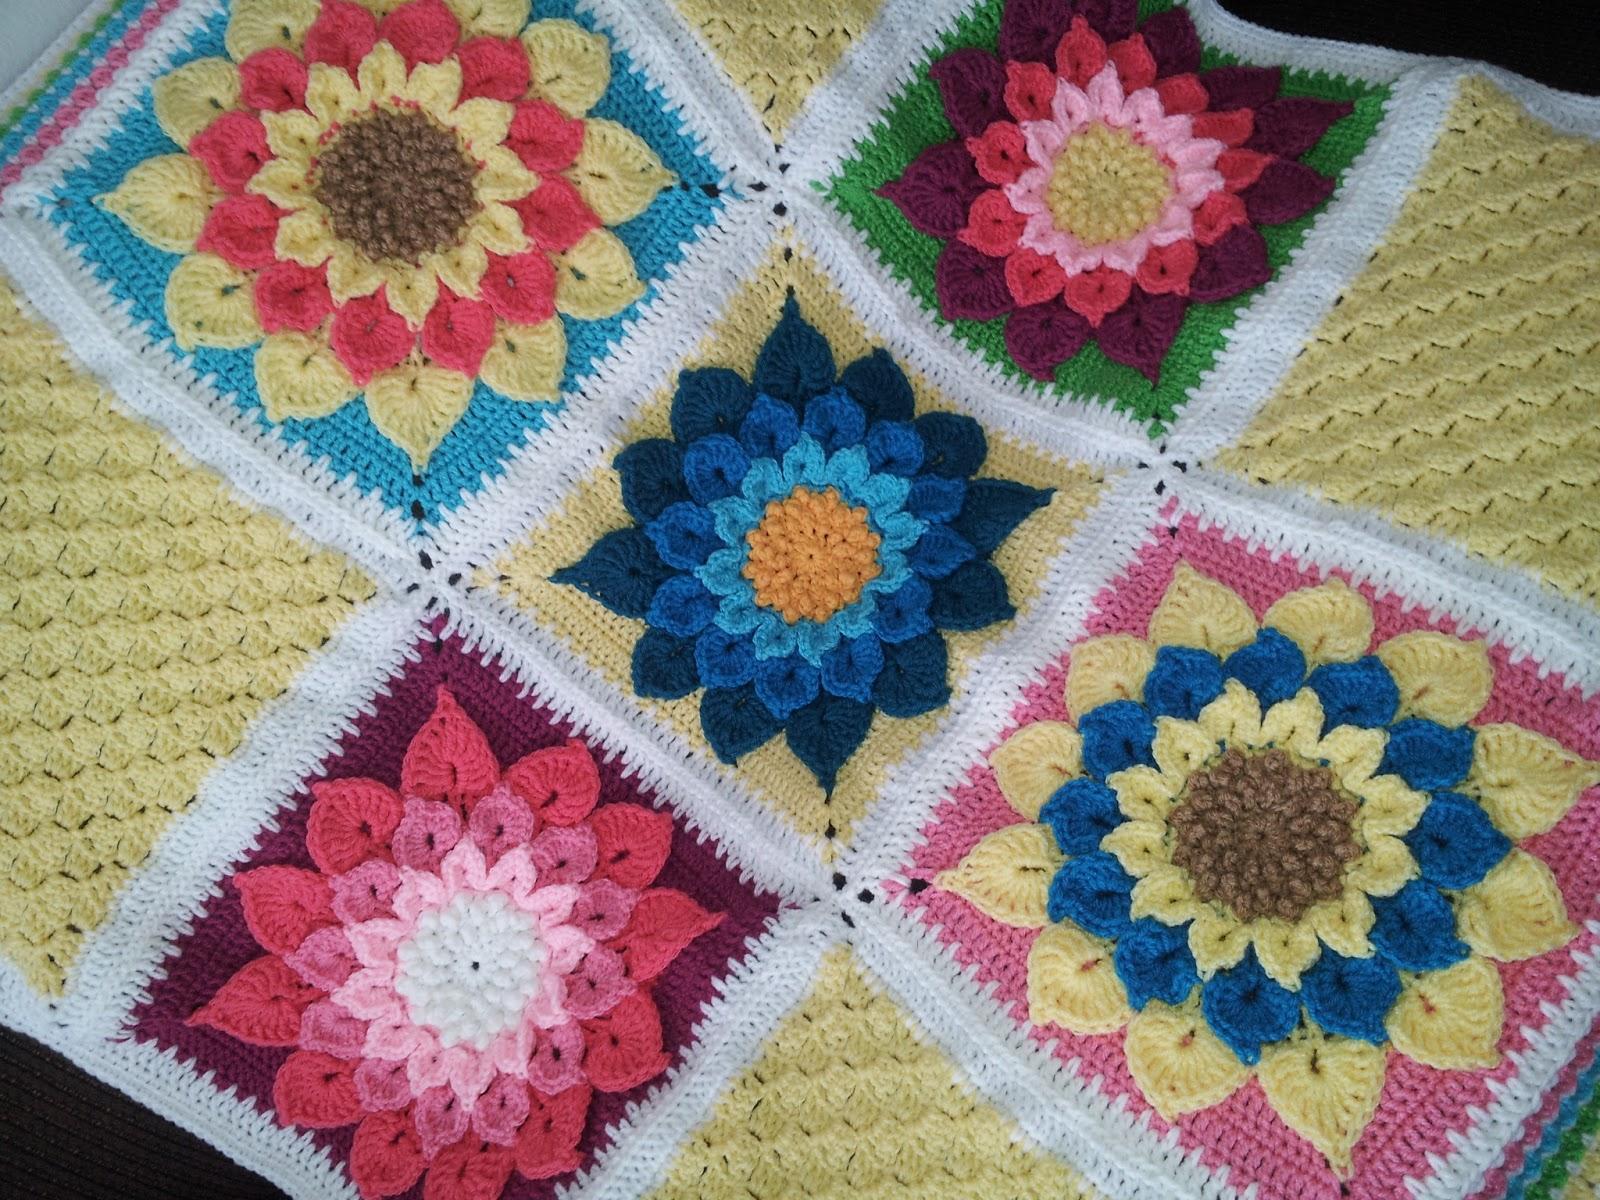 Crochet Hook N Yarn: Pretty Flower ❀❀❀❀ Afghan ❤❤❤❤!